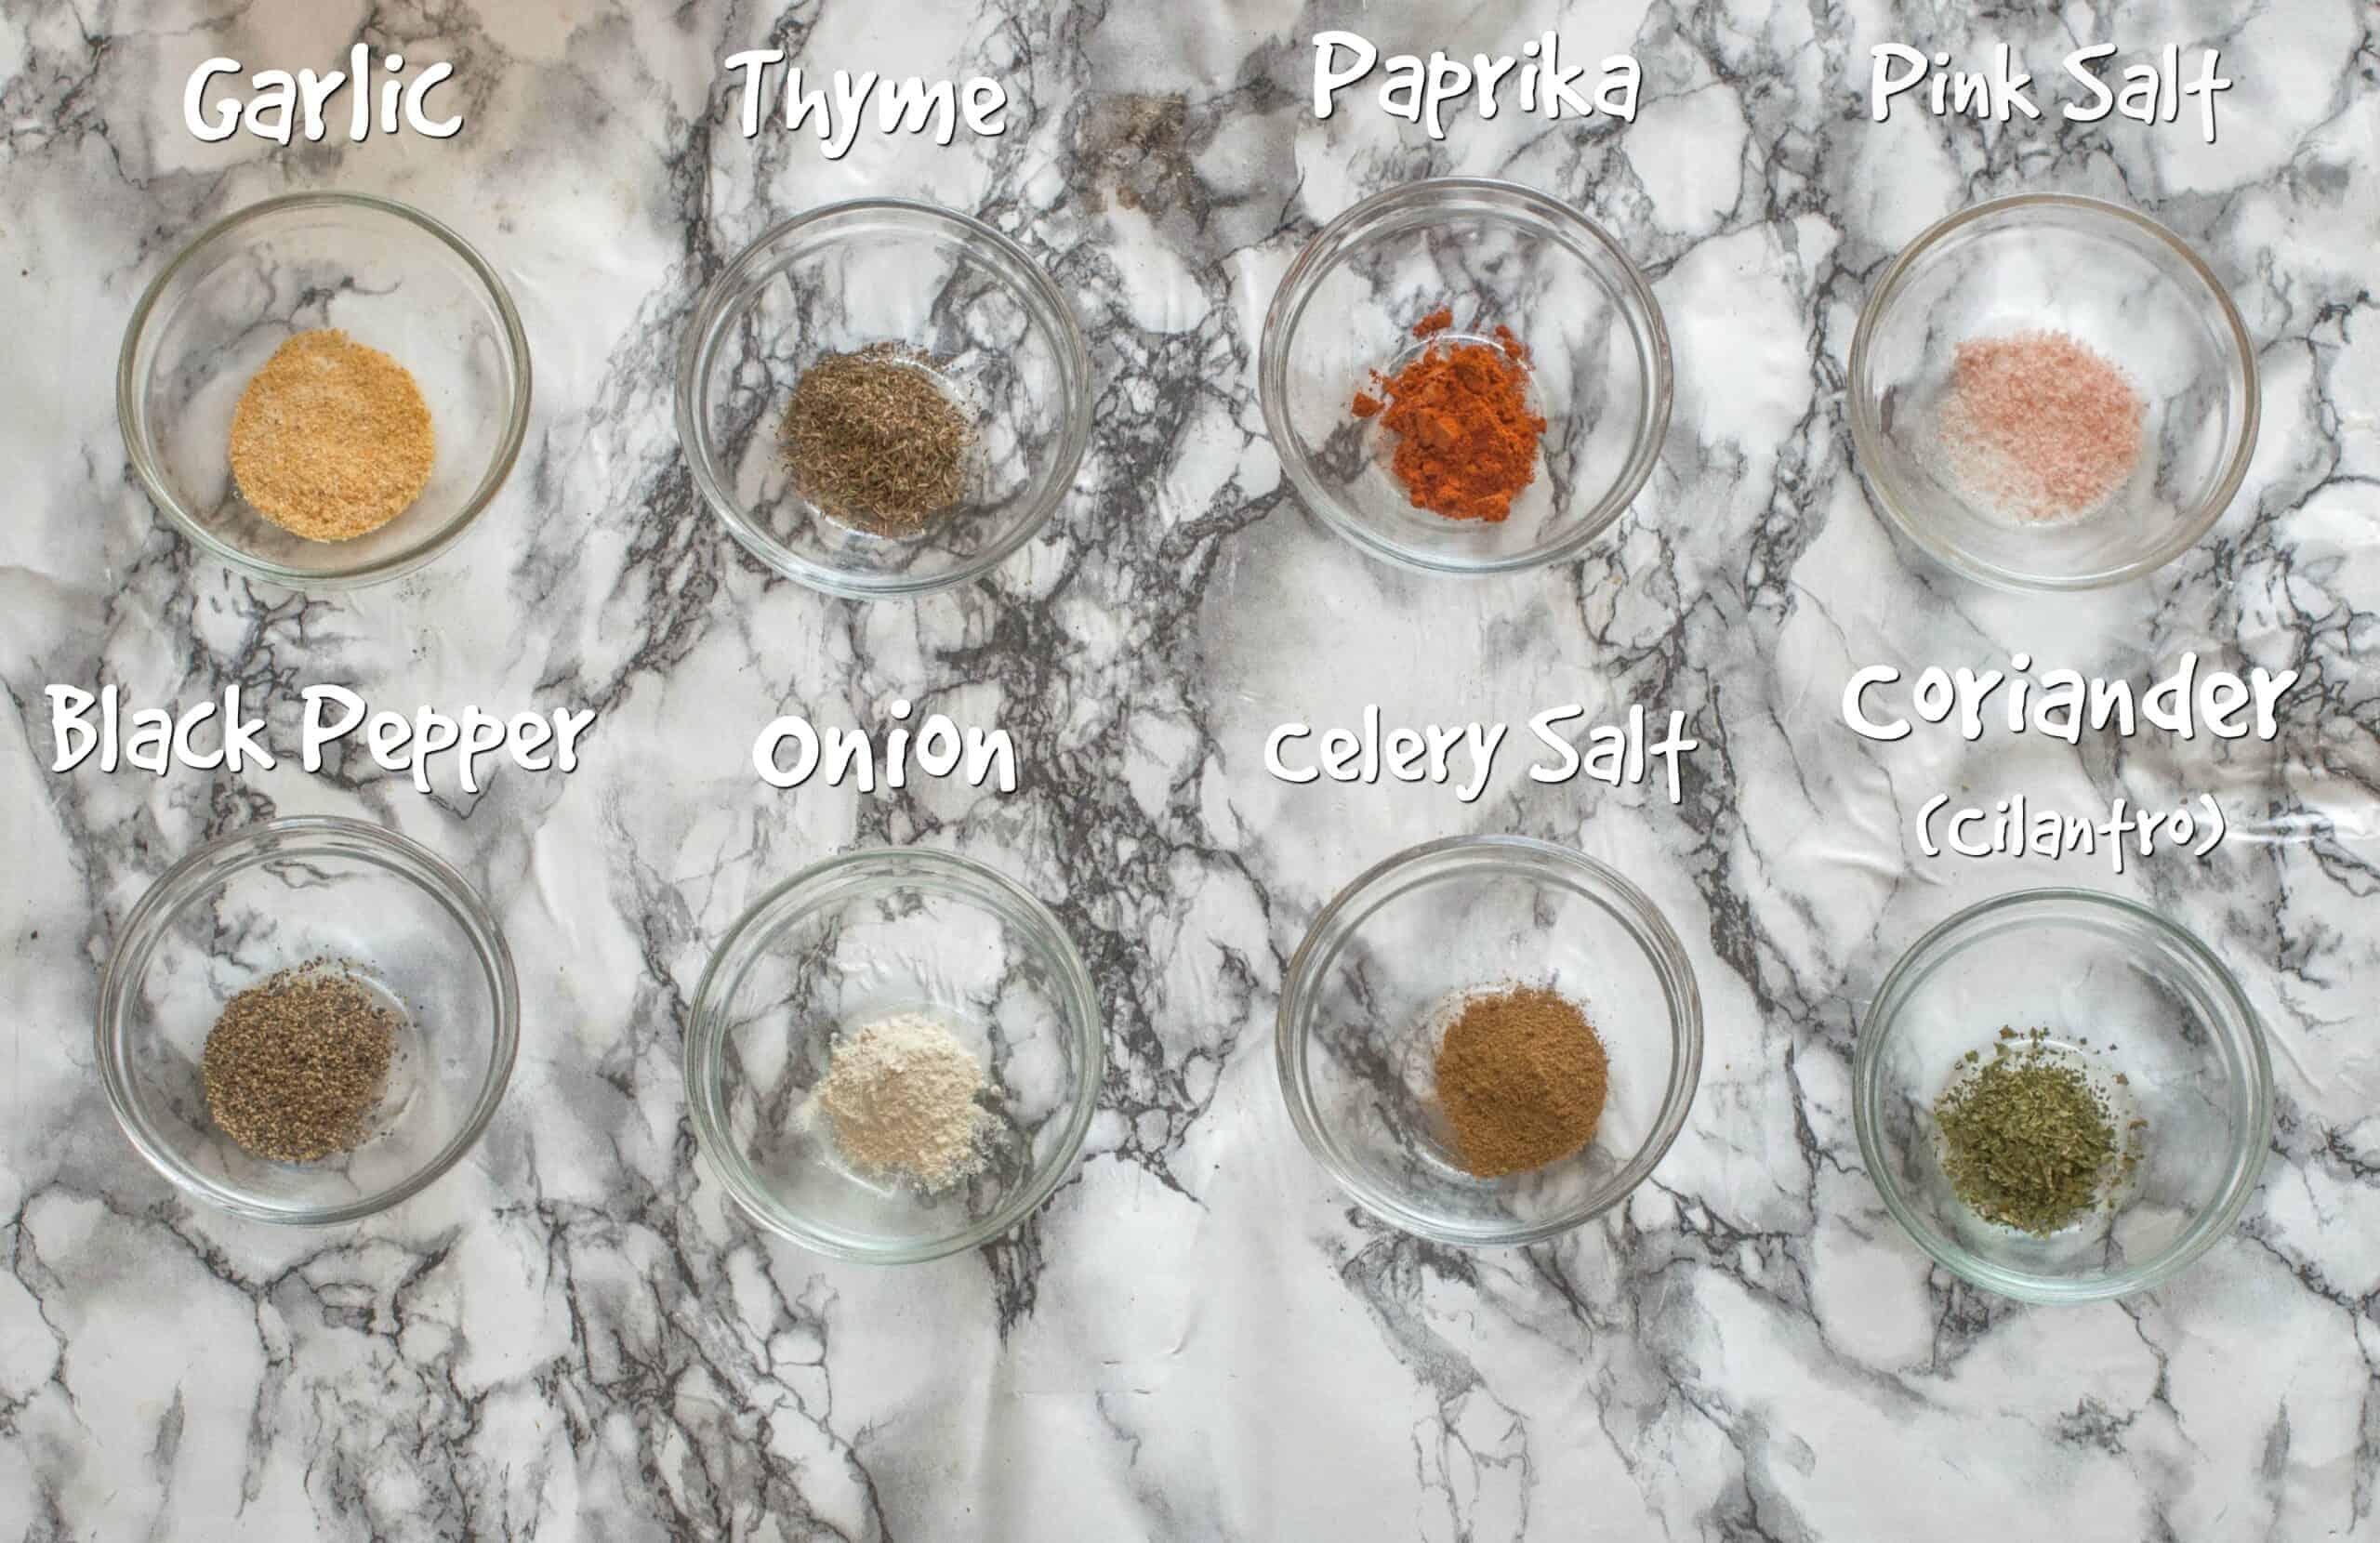 ingredients for the seafood seasoning recipe